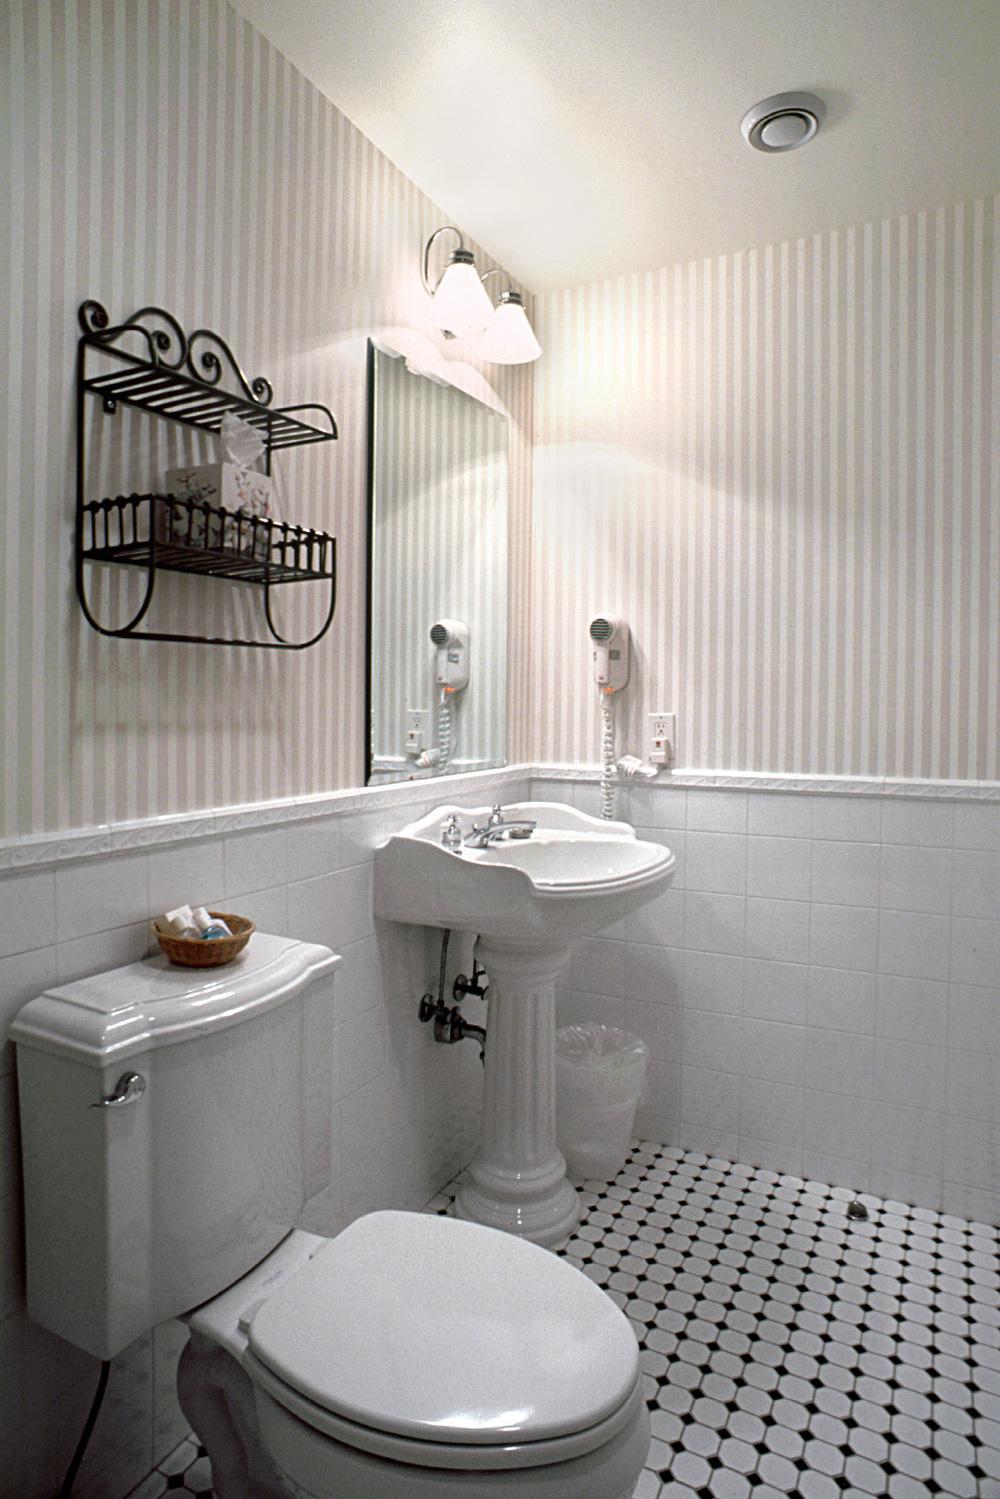 Southhamton Inn. Tobin Parnes Design. NY. Hospitality Design. Suite Restroom.